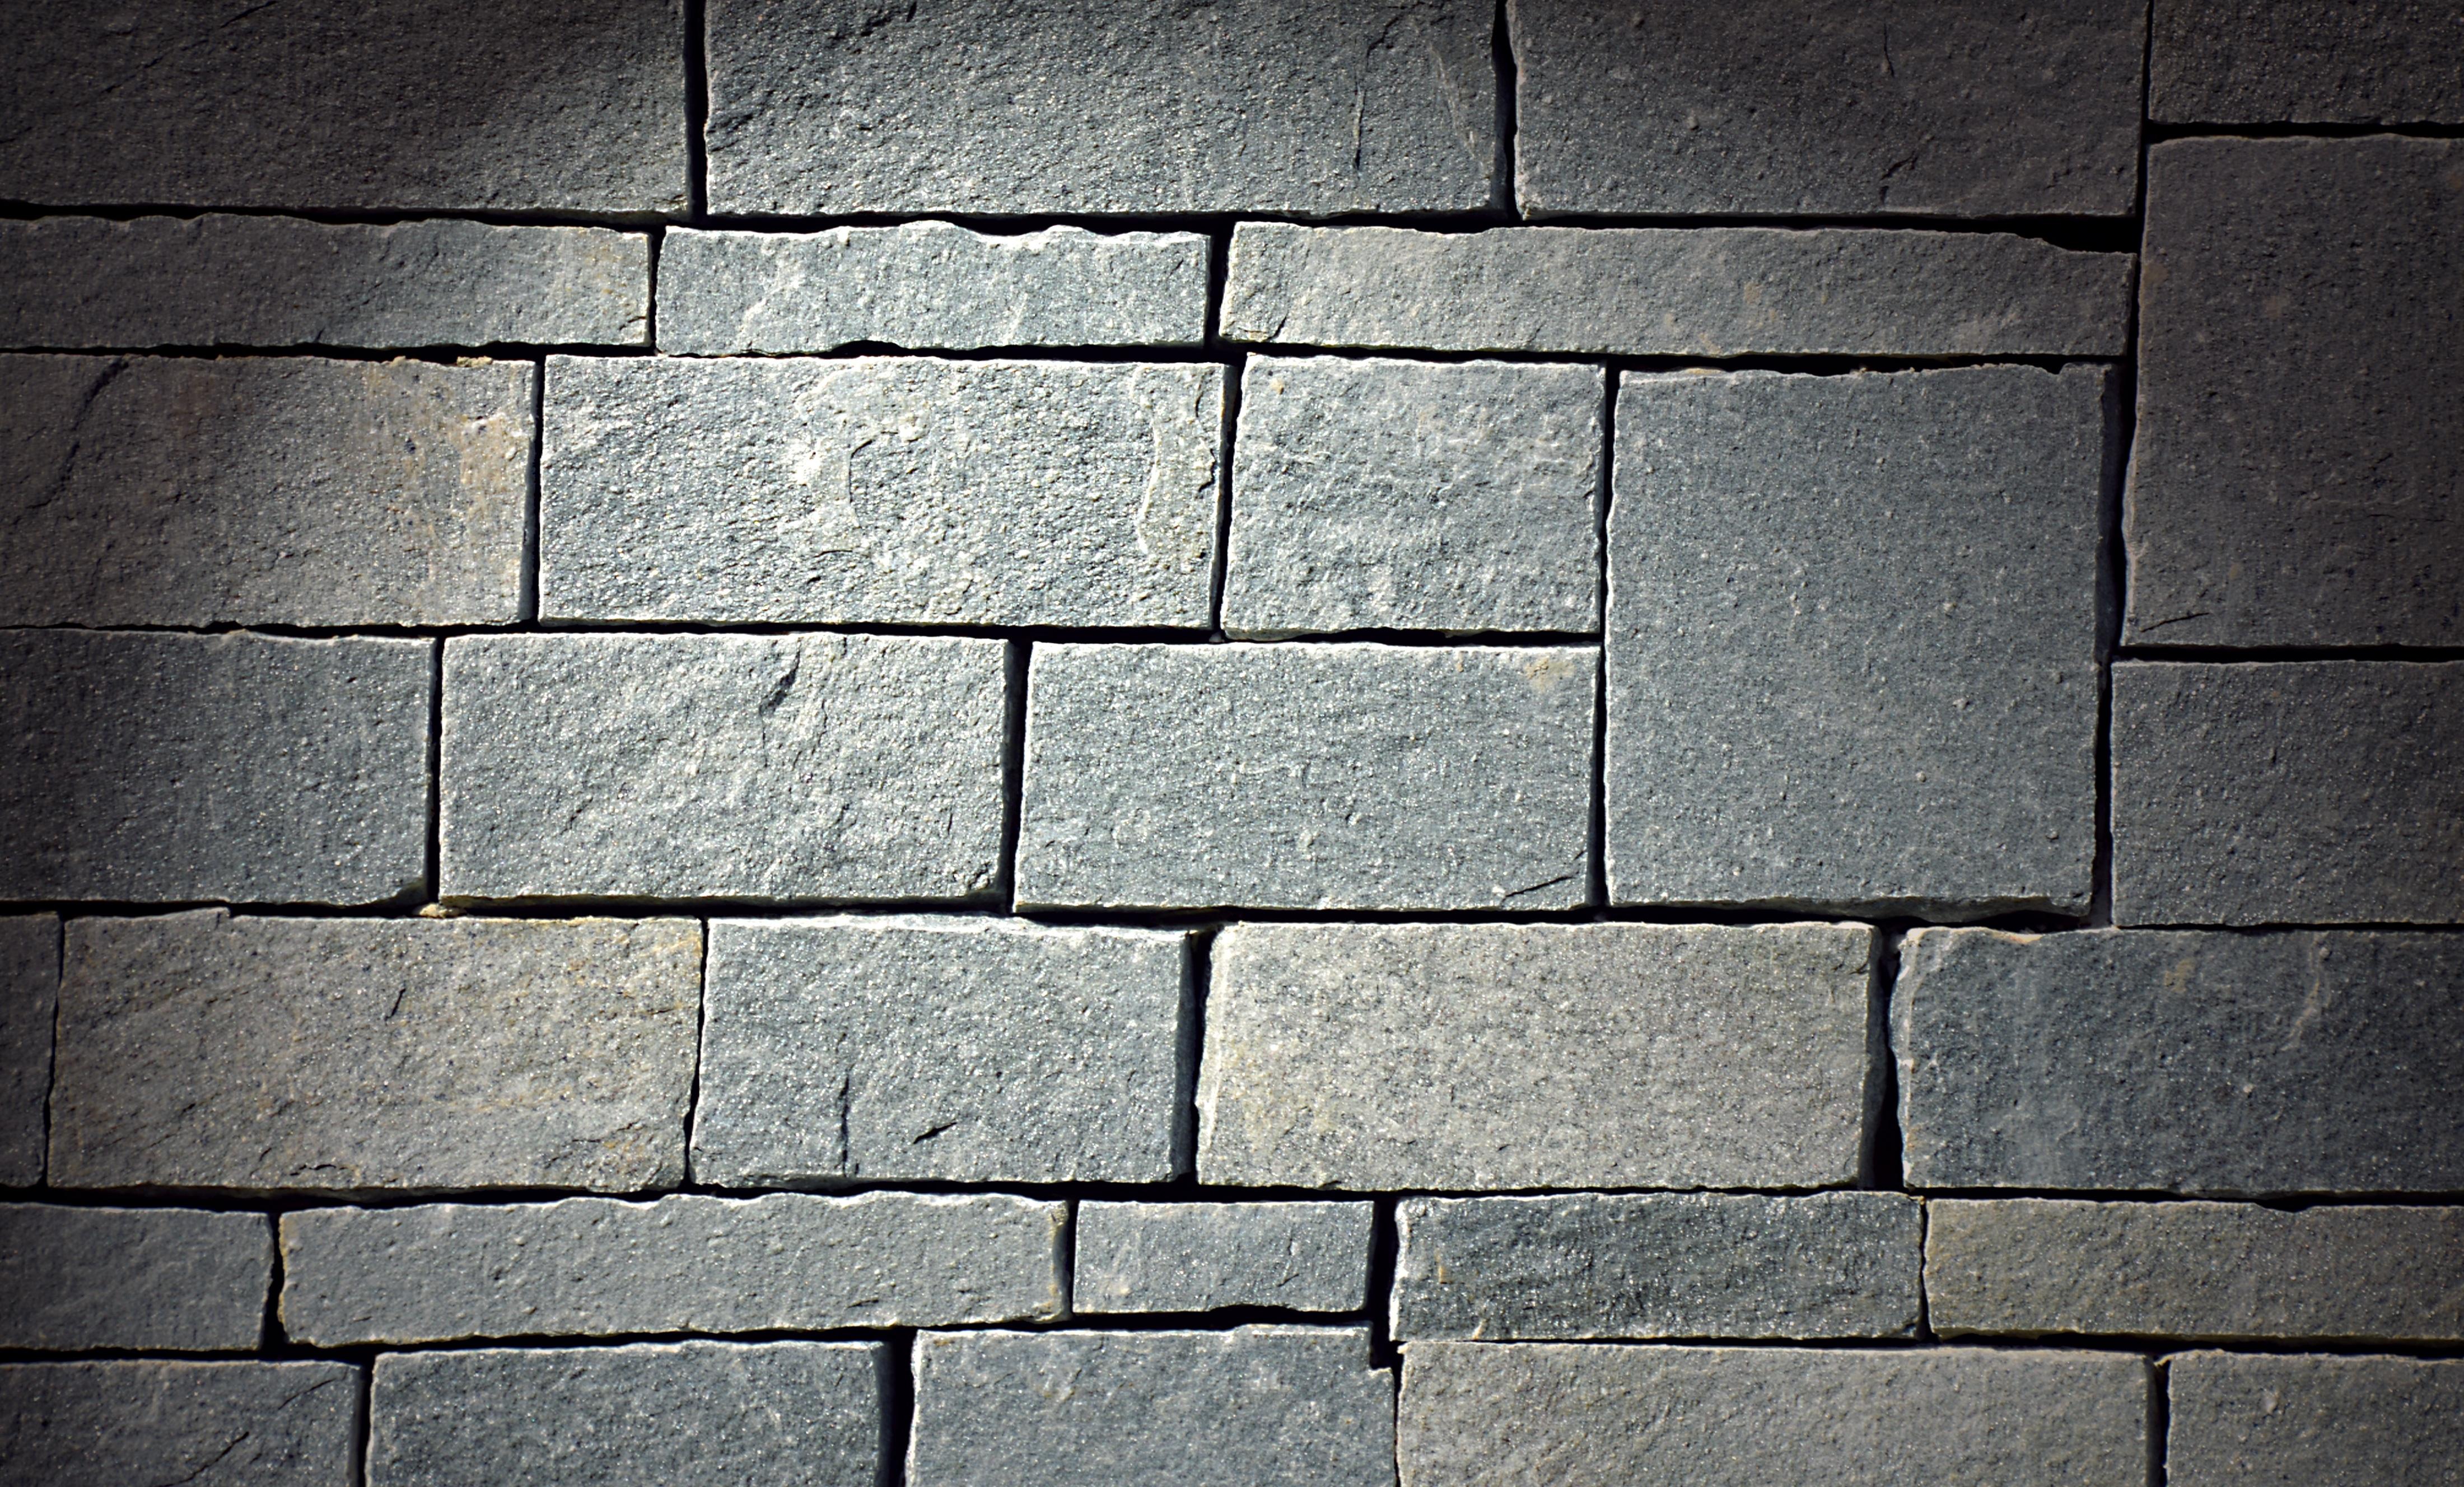 Architecture Wood Ground Texture Floor Cobblestone Wall Asphalt Flow Tile Lamp Brick Lighting Material Spotlight Slate